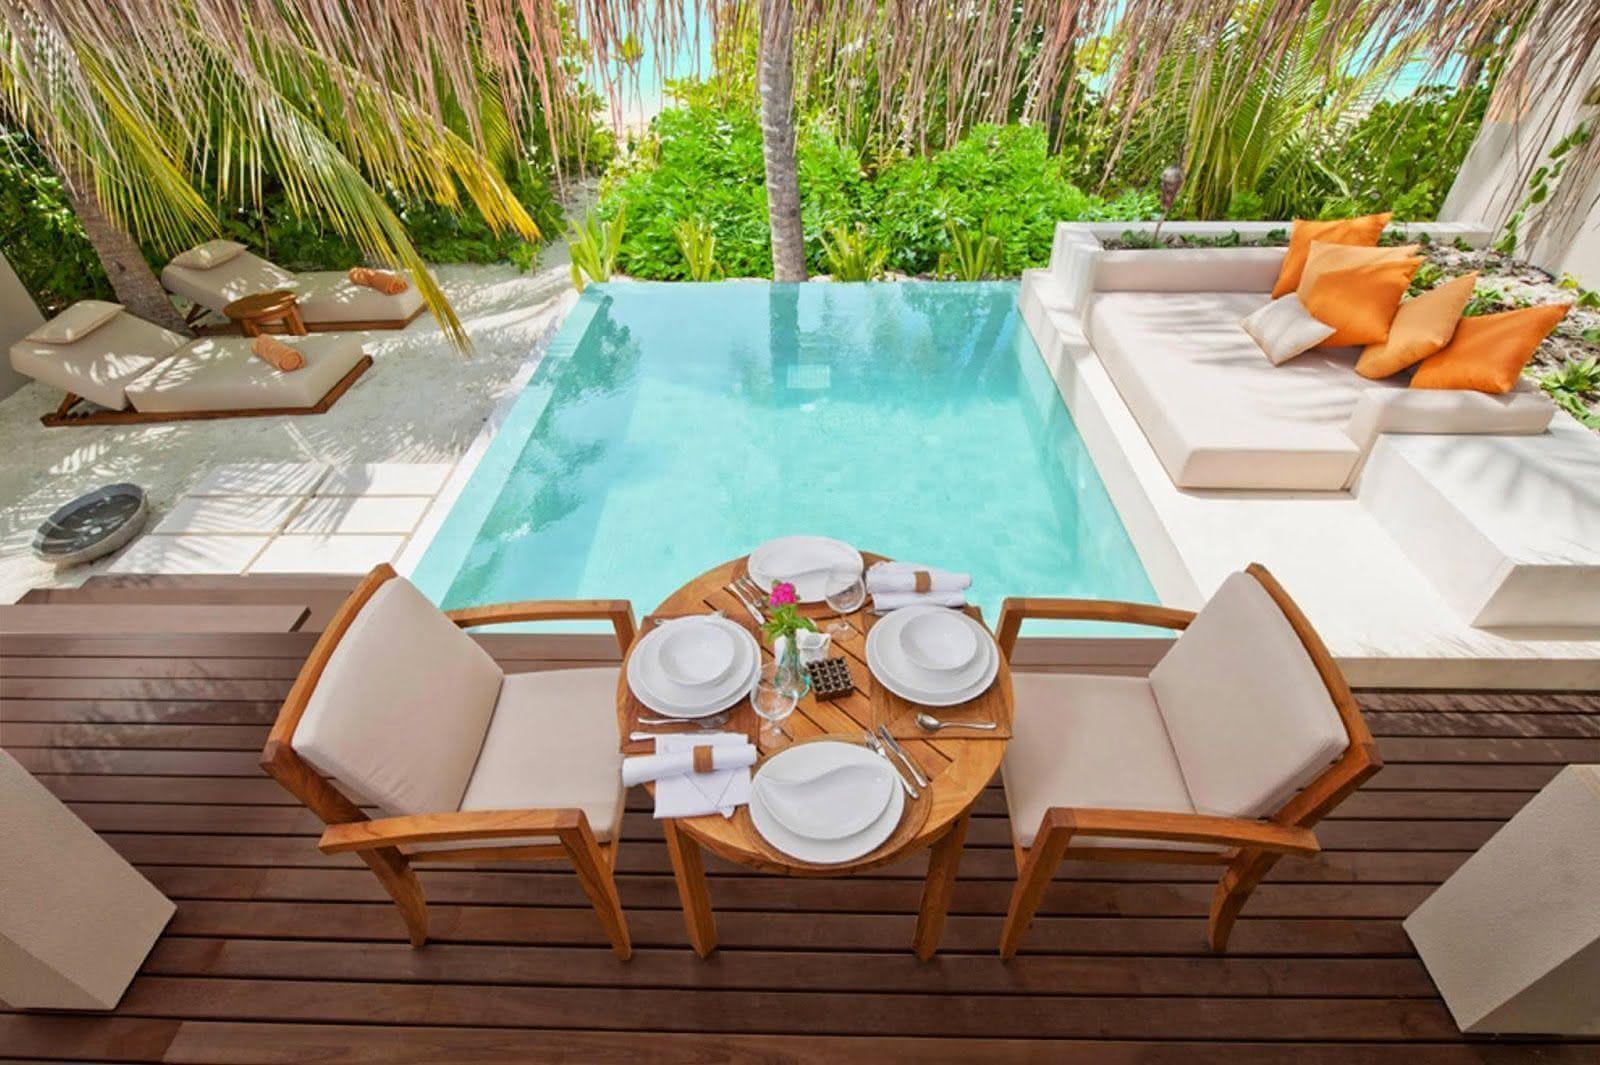 90 piscinas pequenas modelos projetos fotos lindas - Piscinas pequenas para jardin ...